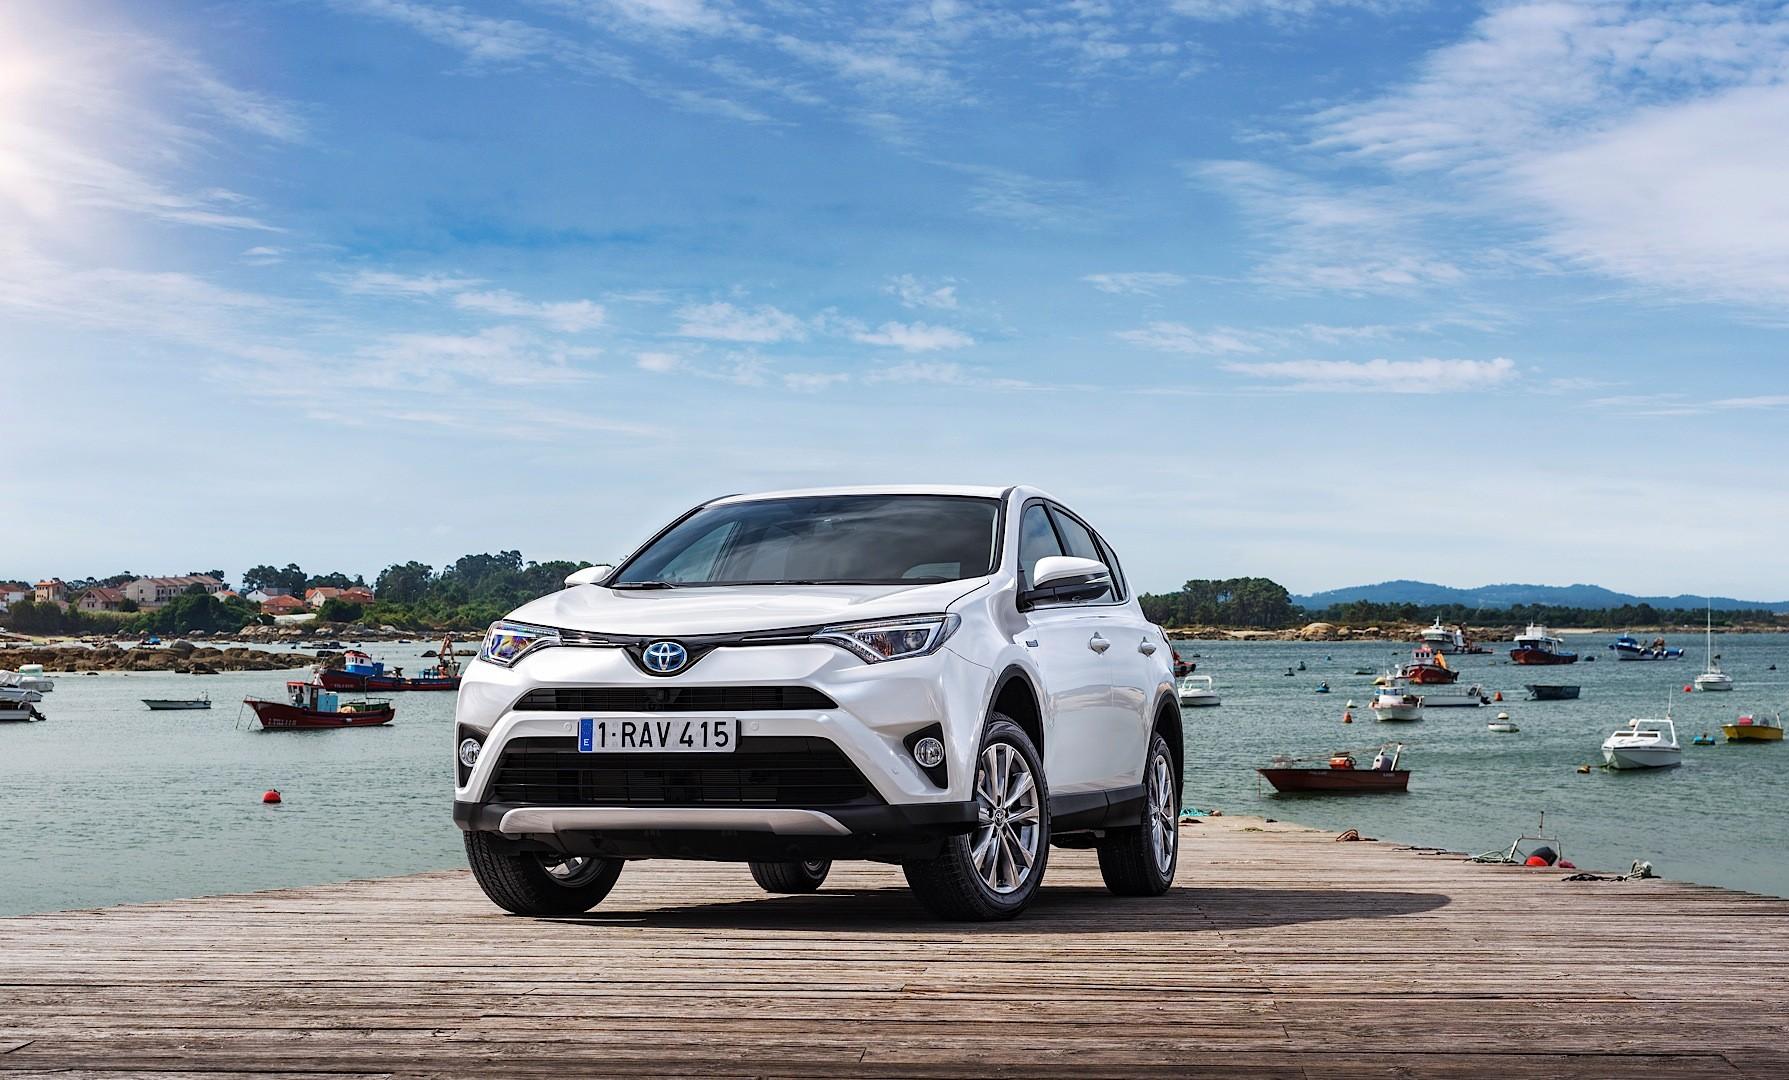 2016 Toyota Rav4 Hybrid One Limited Edition Marks European